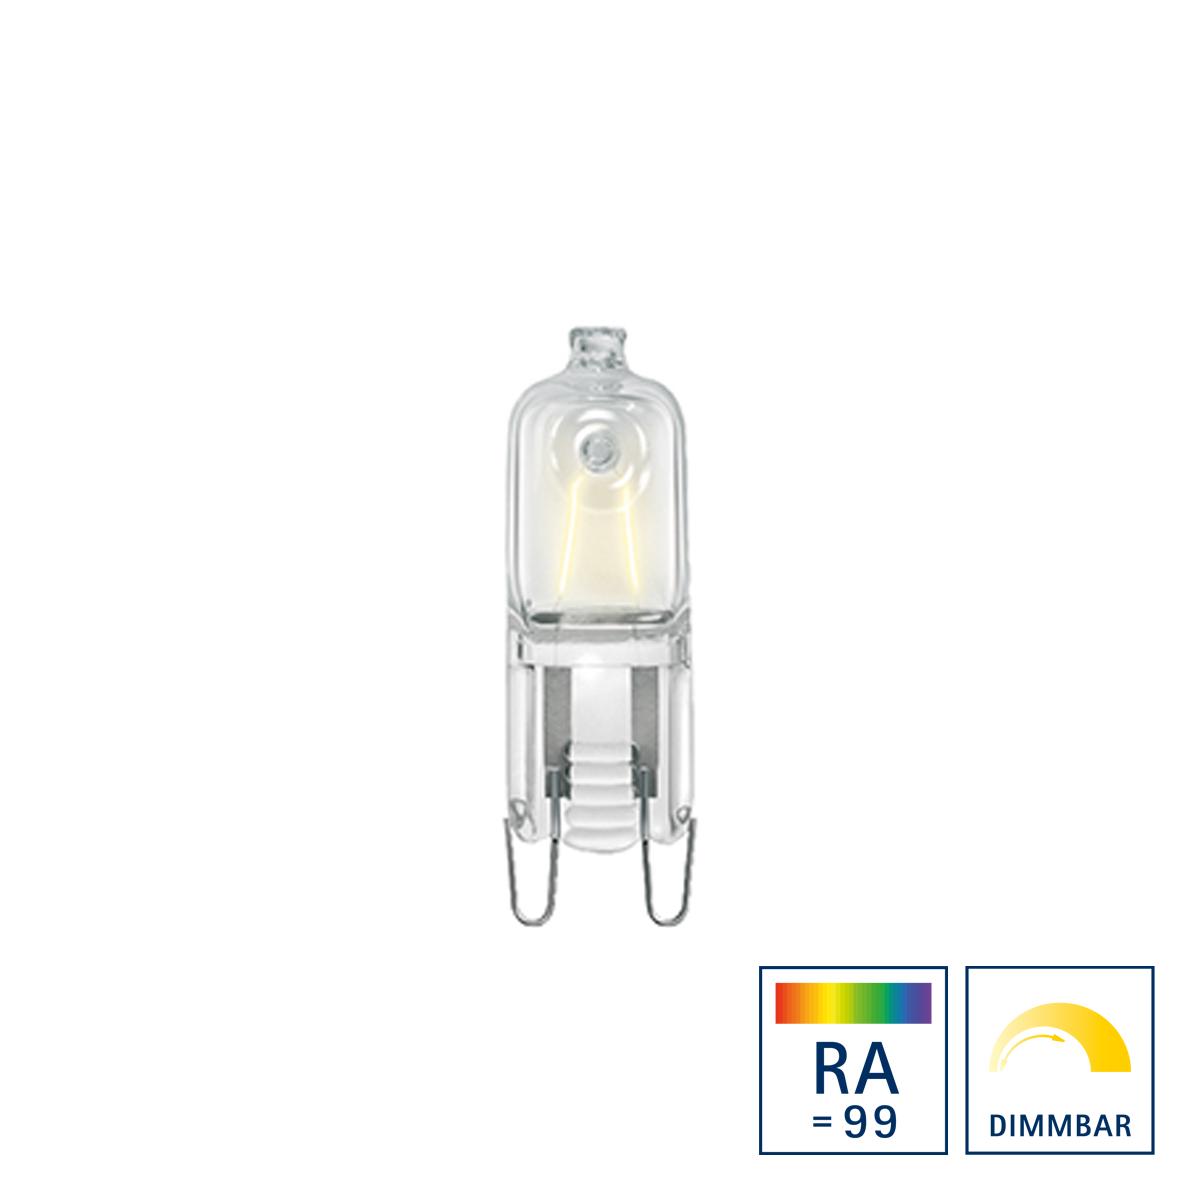 Sigor Halogenlampe 230 V G9, 33 W